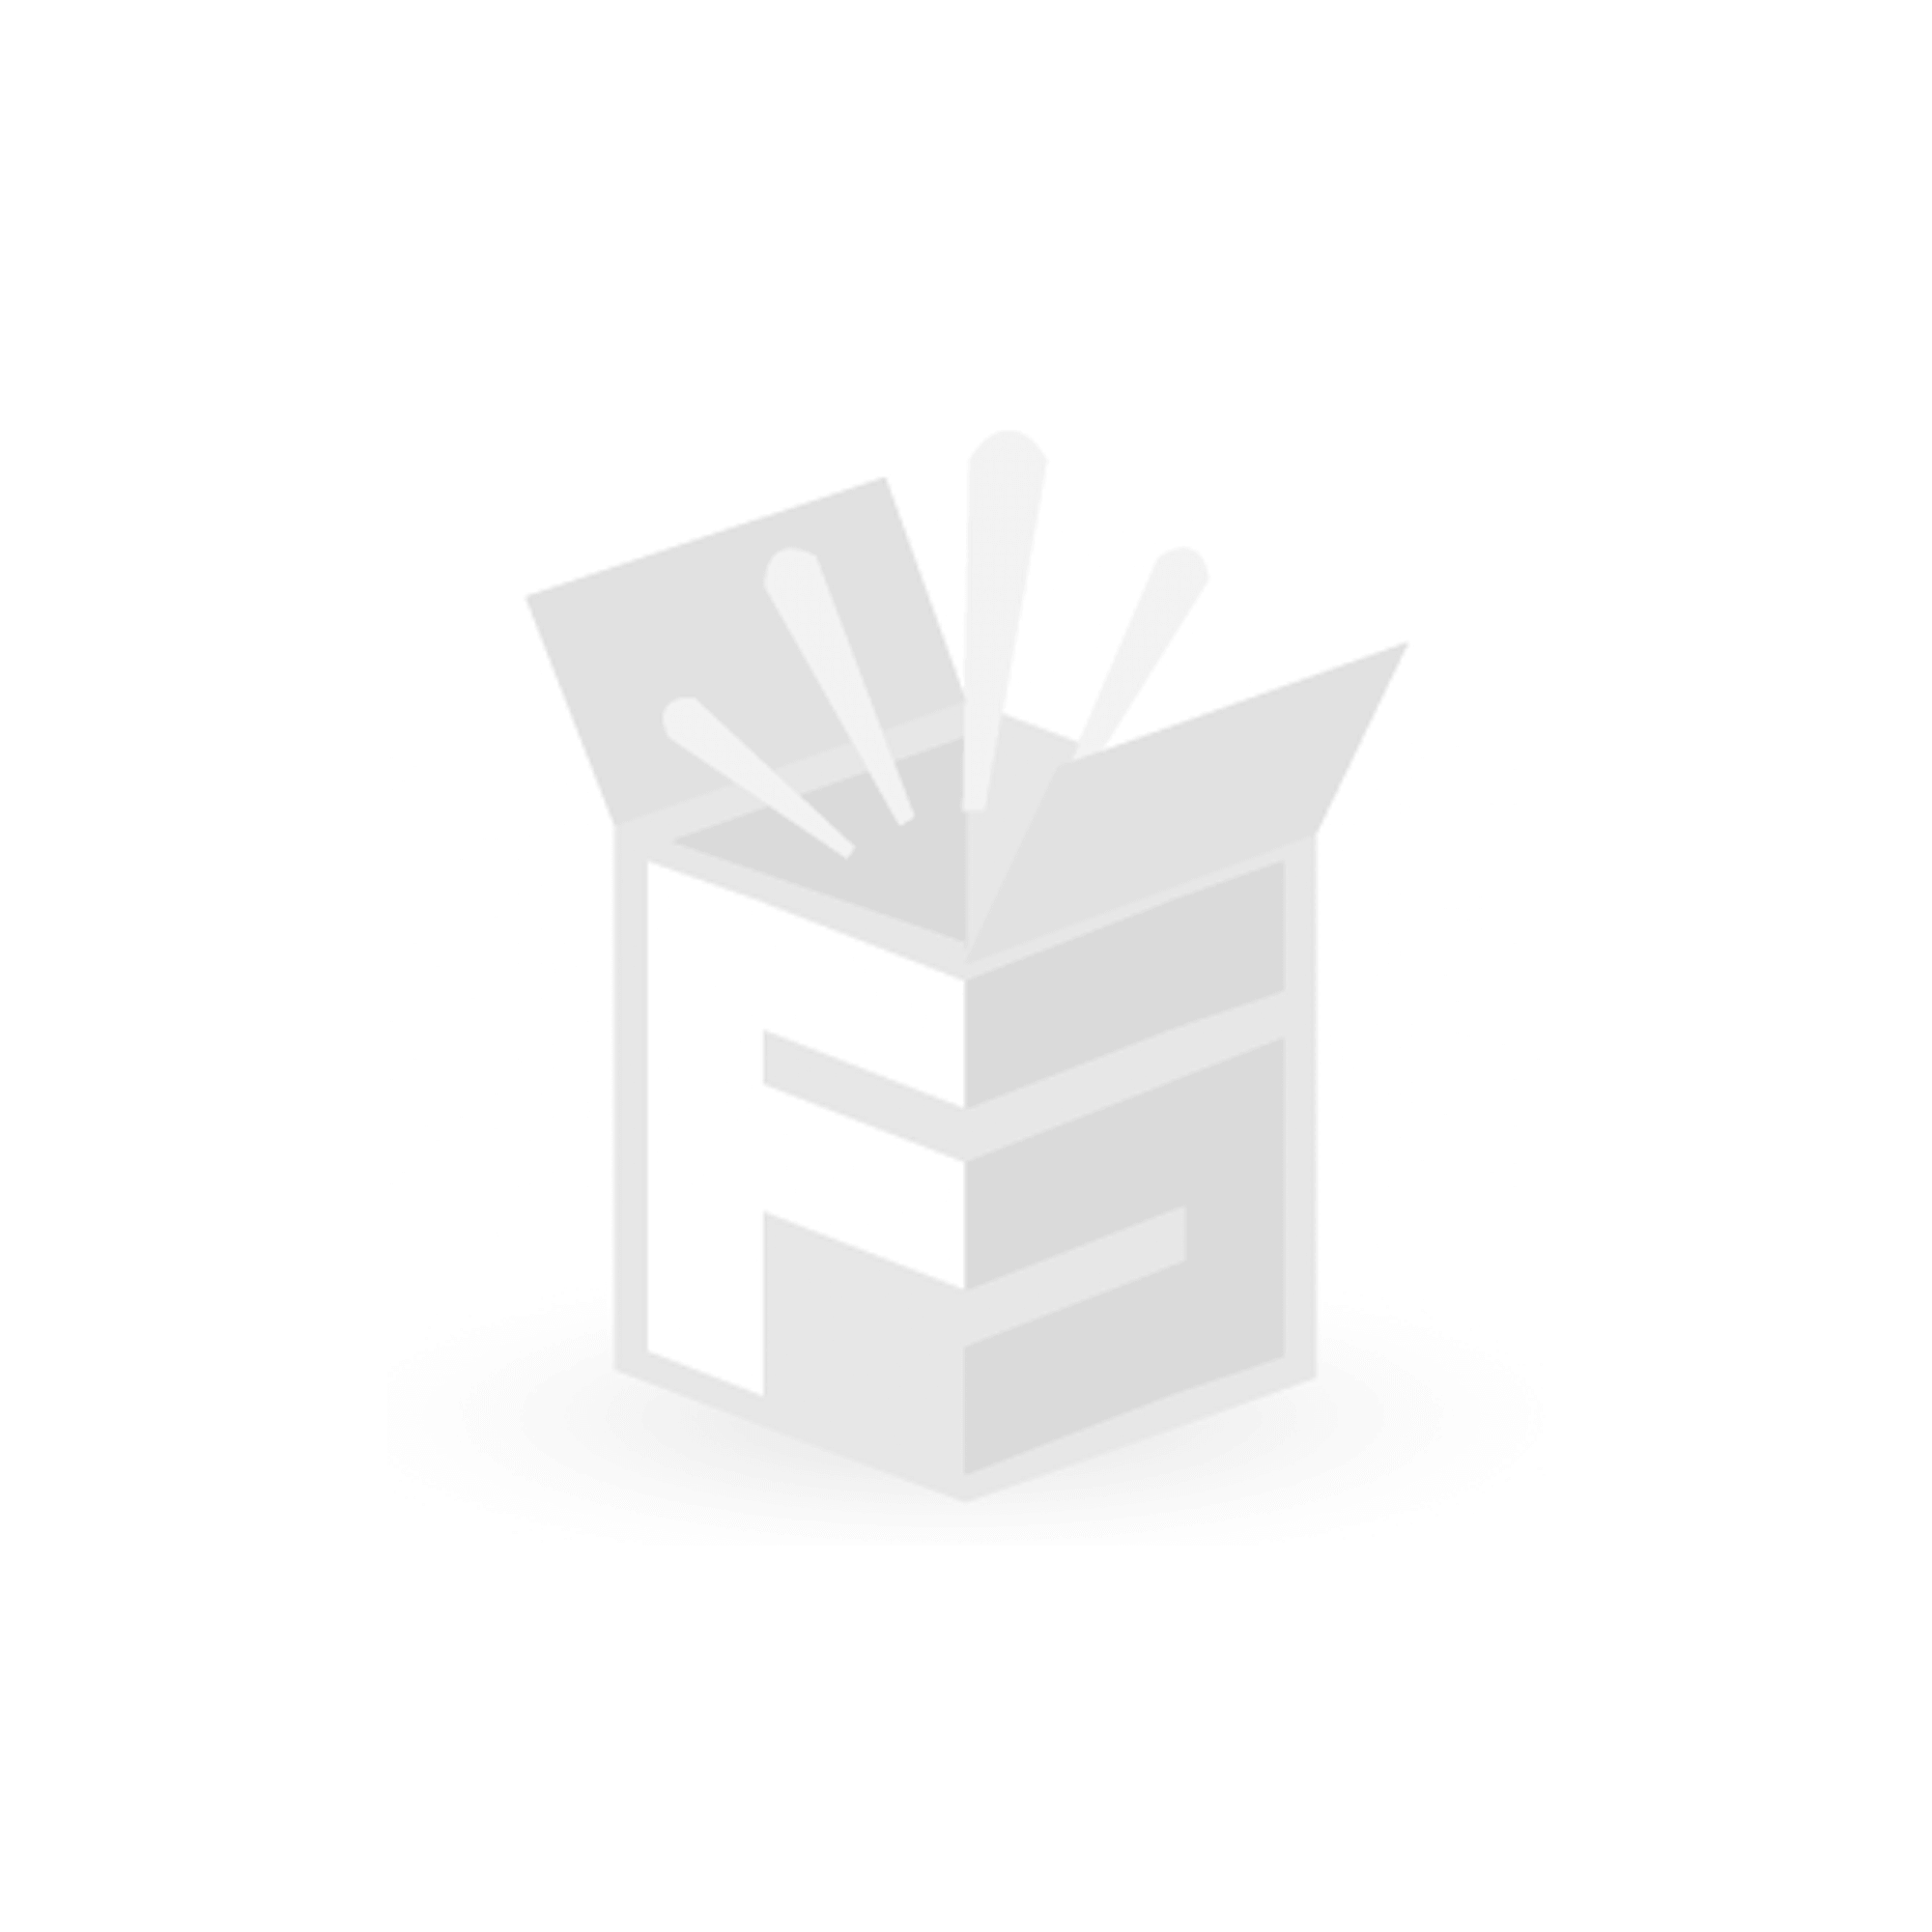 Kinzo Steckschlüssel Set 46-tlg